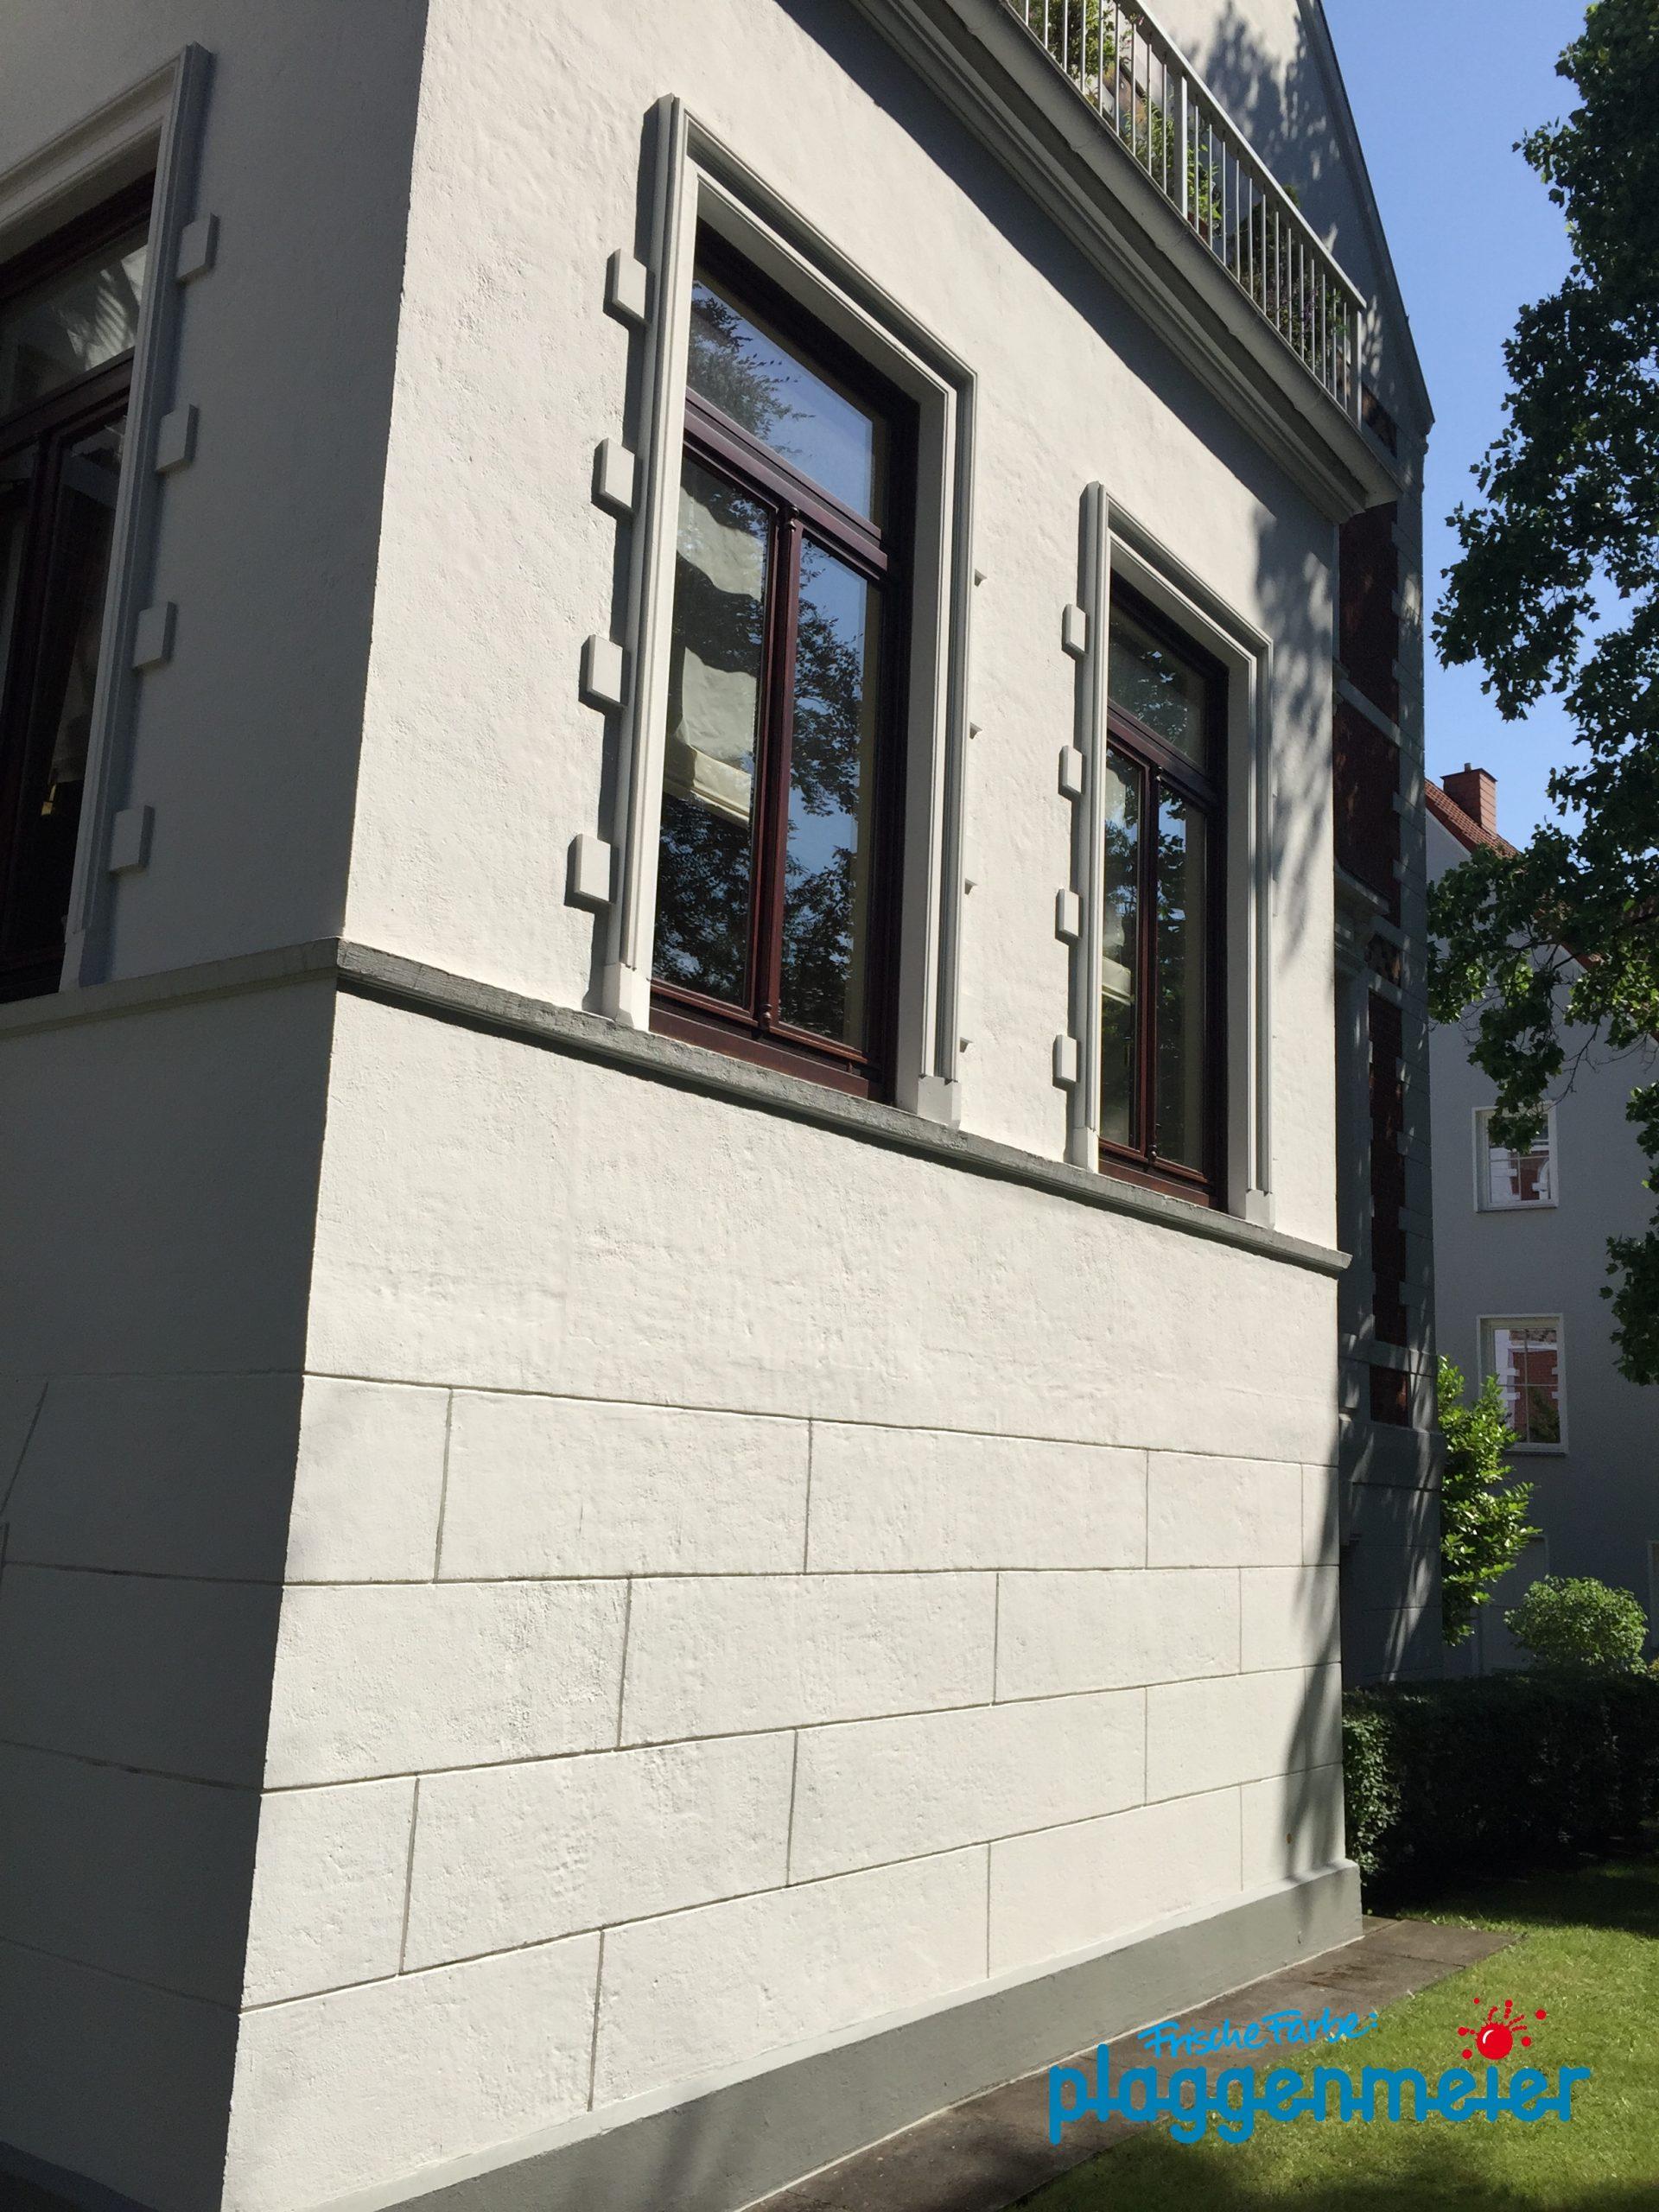 Full Size of Fenster Bremen Maler Plaggenmeier042 Arno Plaggenmeier Gmbh Holz Alu Preise Online Konfigurieren Sonnenschutz Rollo Konfigurator Velux Aluplast Fenster Fenster Bremen